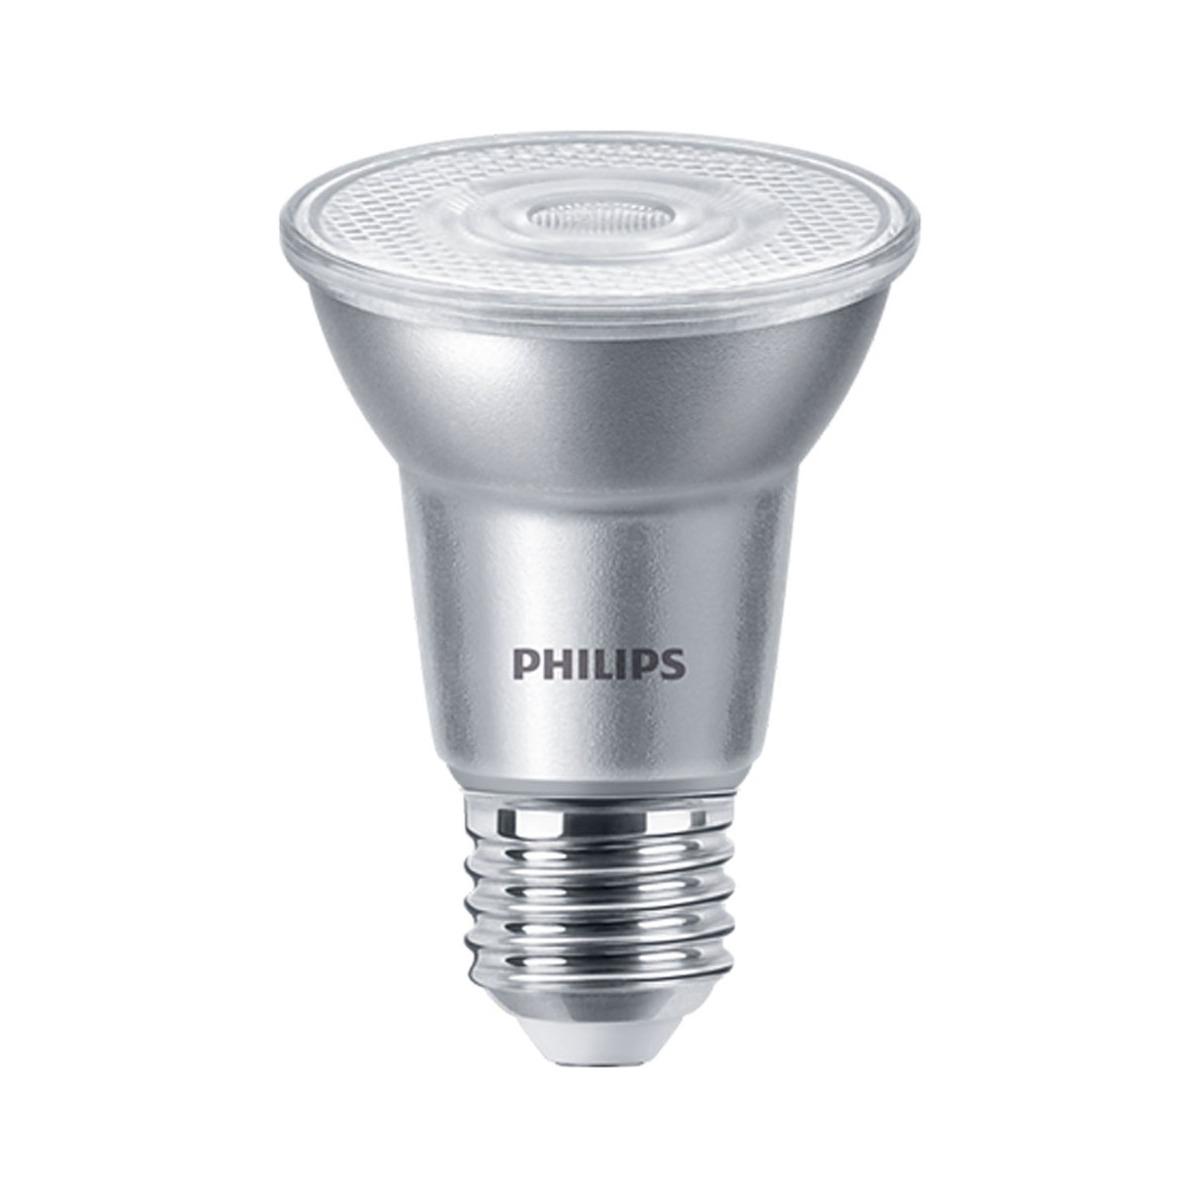 Philips LEDspot E27 PAR20 6W 840 25D 540lm (MASTER) | Dimbaar - Koel Wit - Vervangt 50W